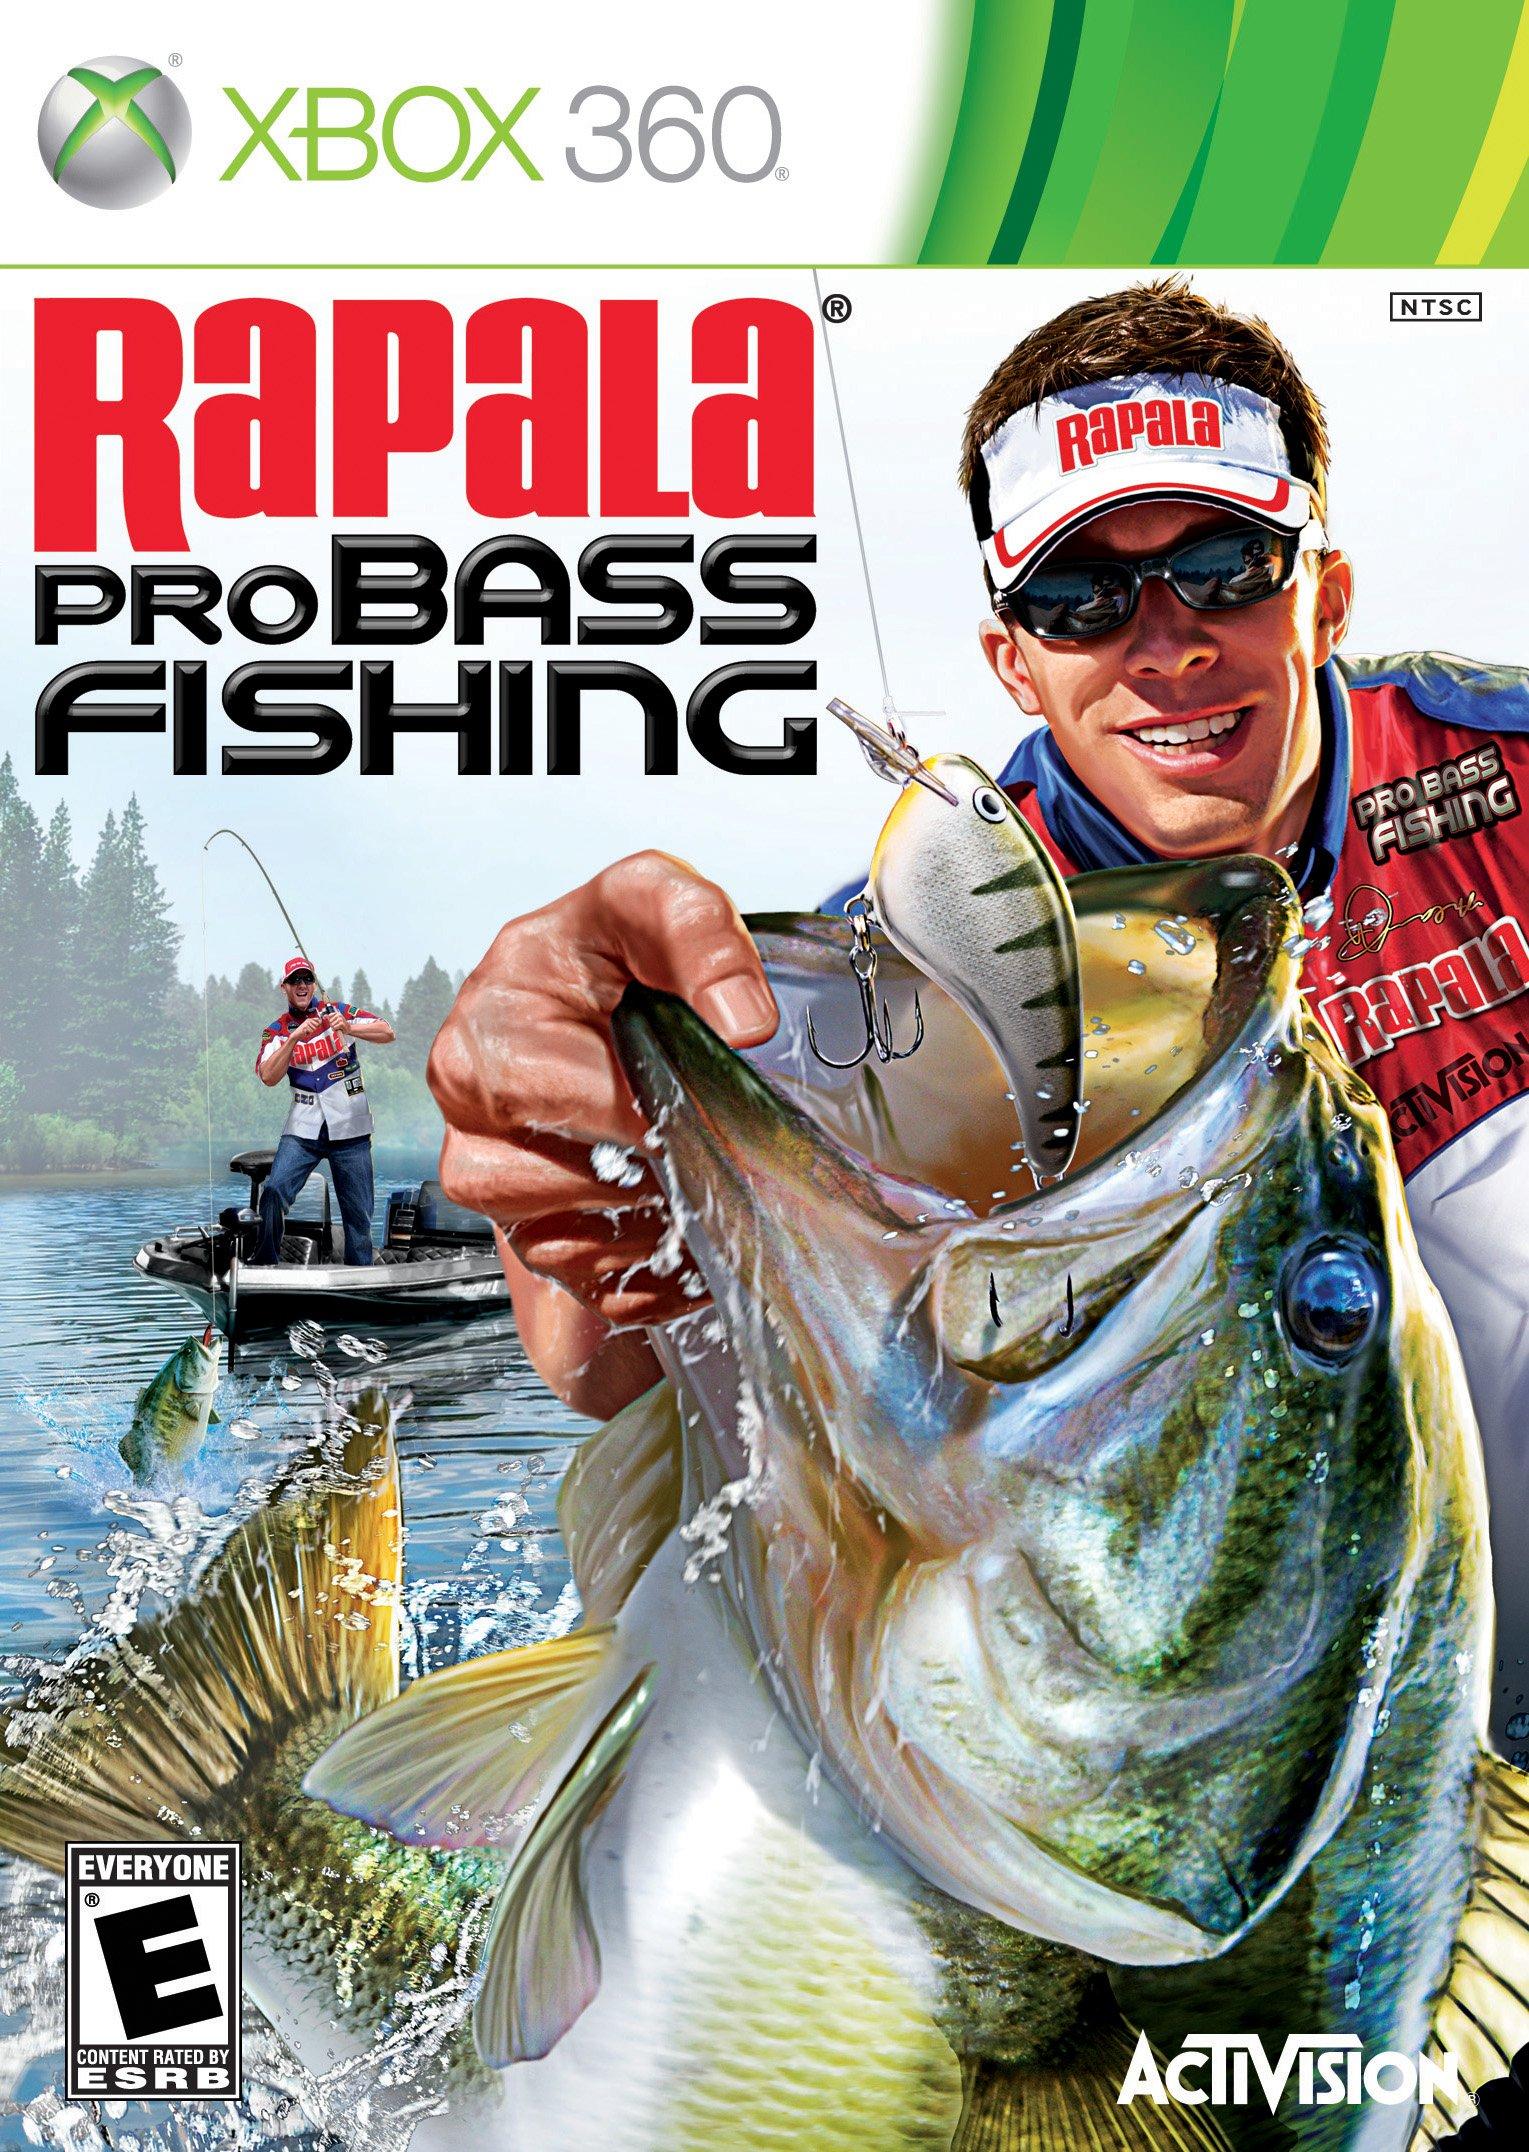 Rapala Pro Bass Fishing 2010 - Xbox 360 by Activision